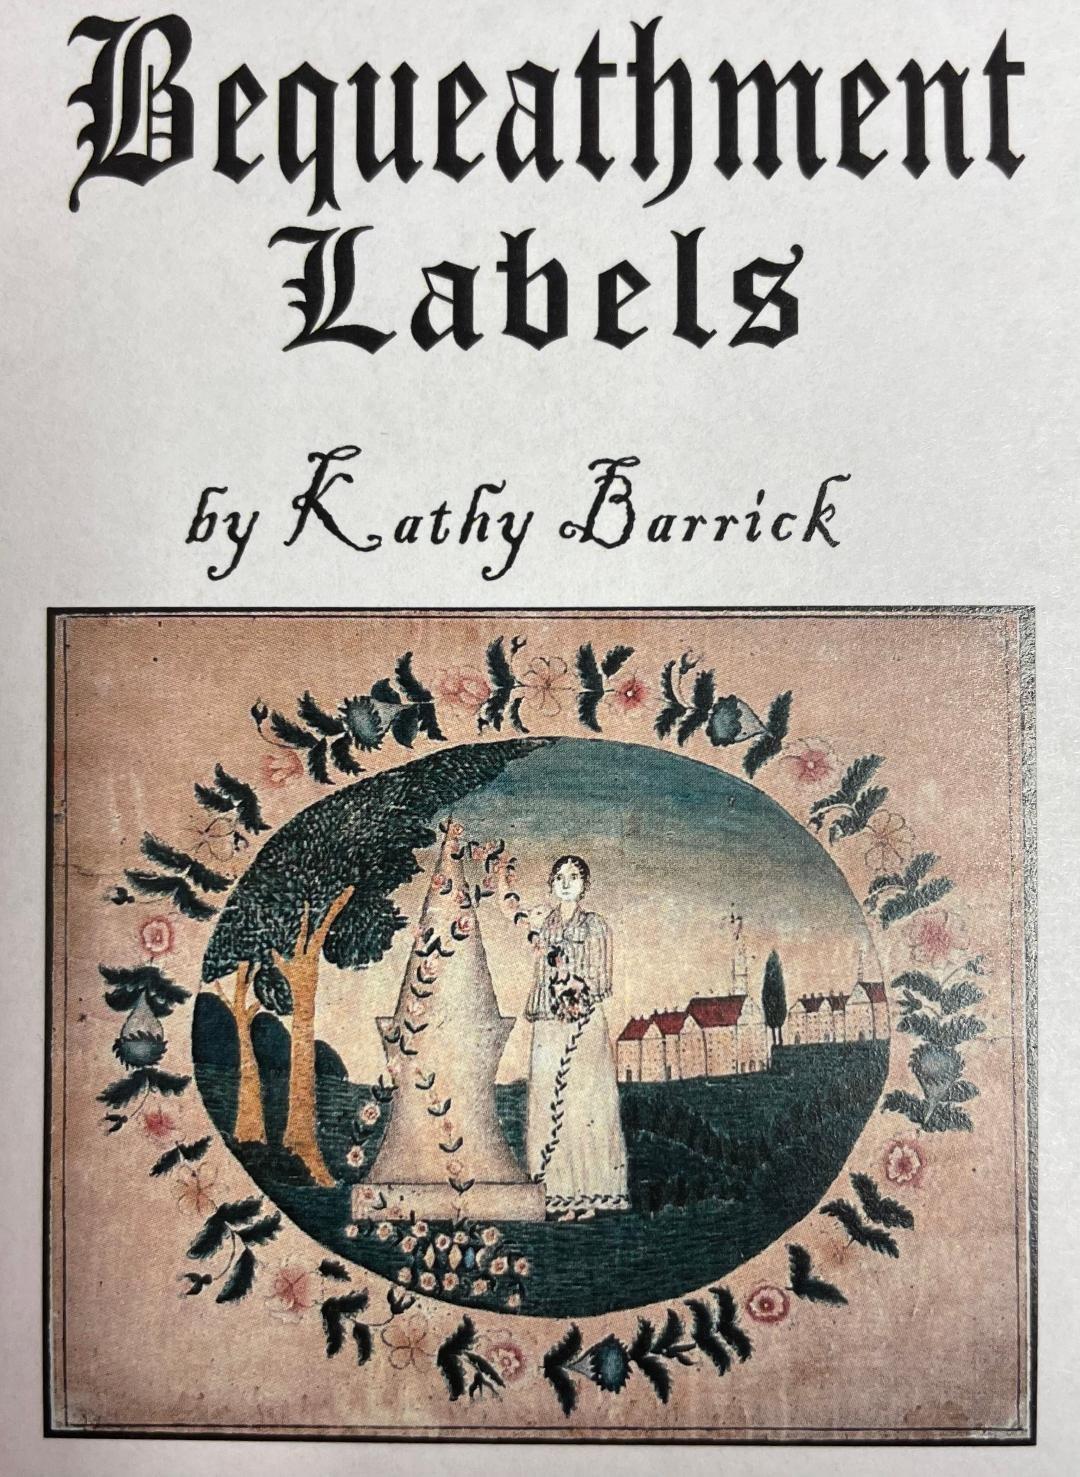 KB Needlework Labels - Bequeathment